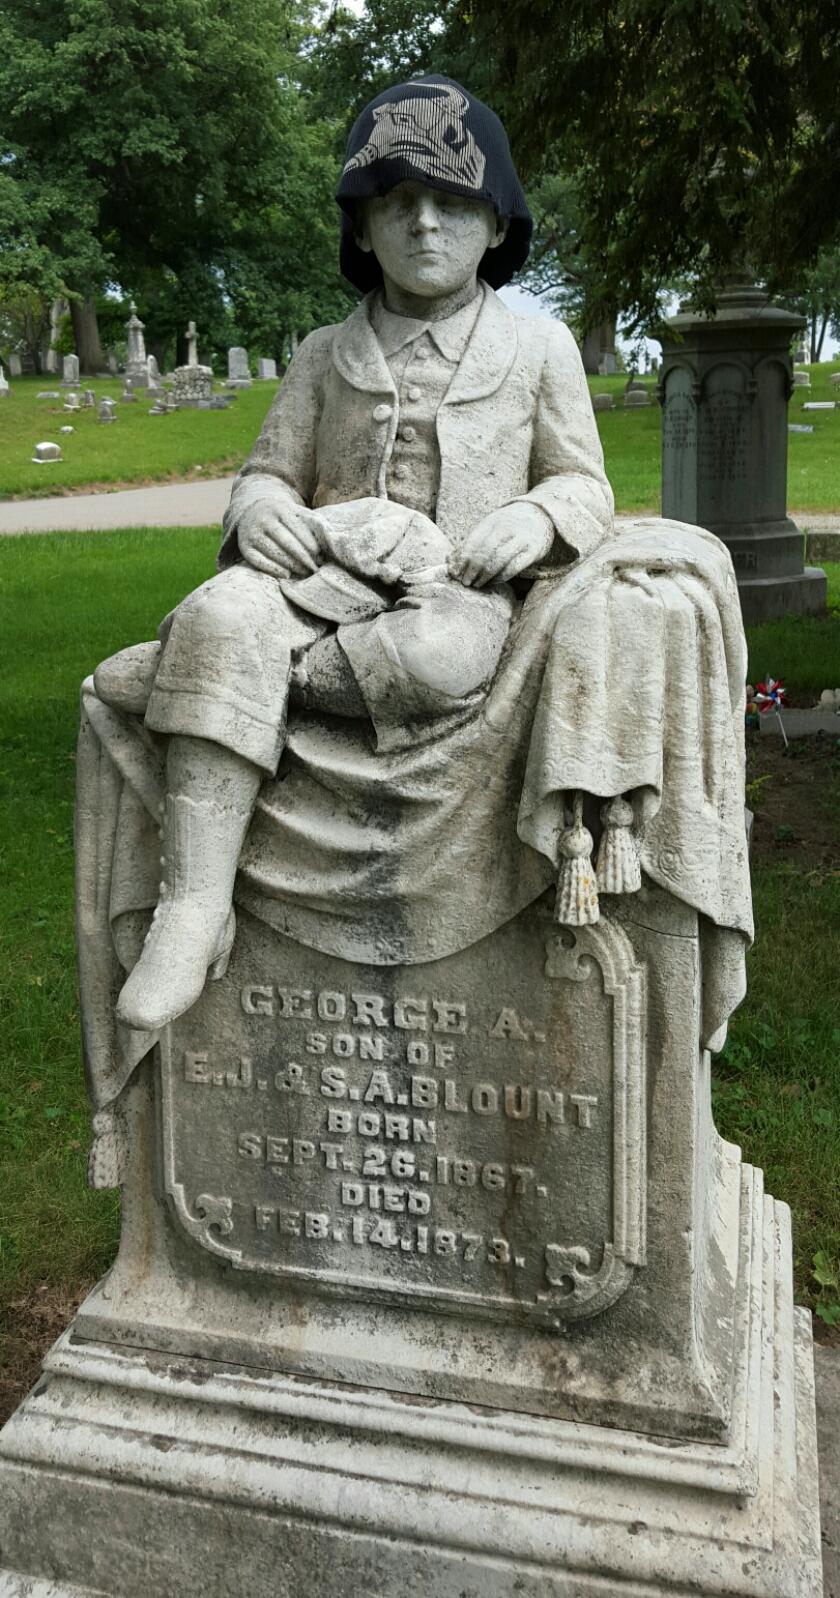 George A Georgie Blount